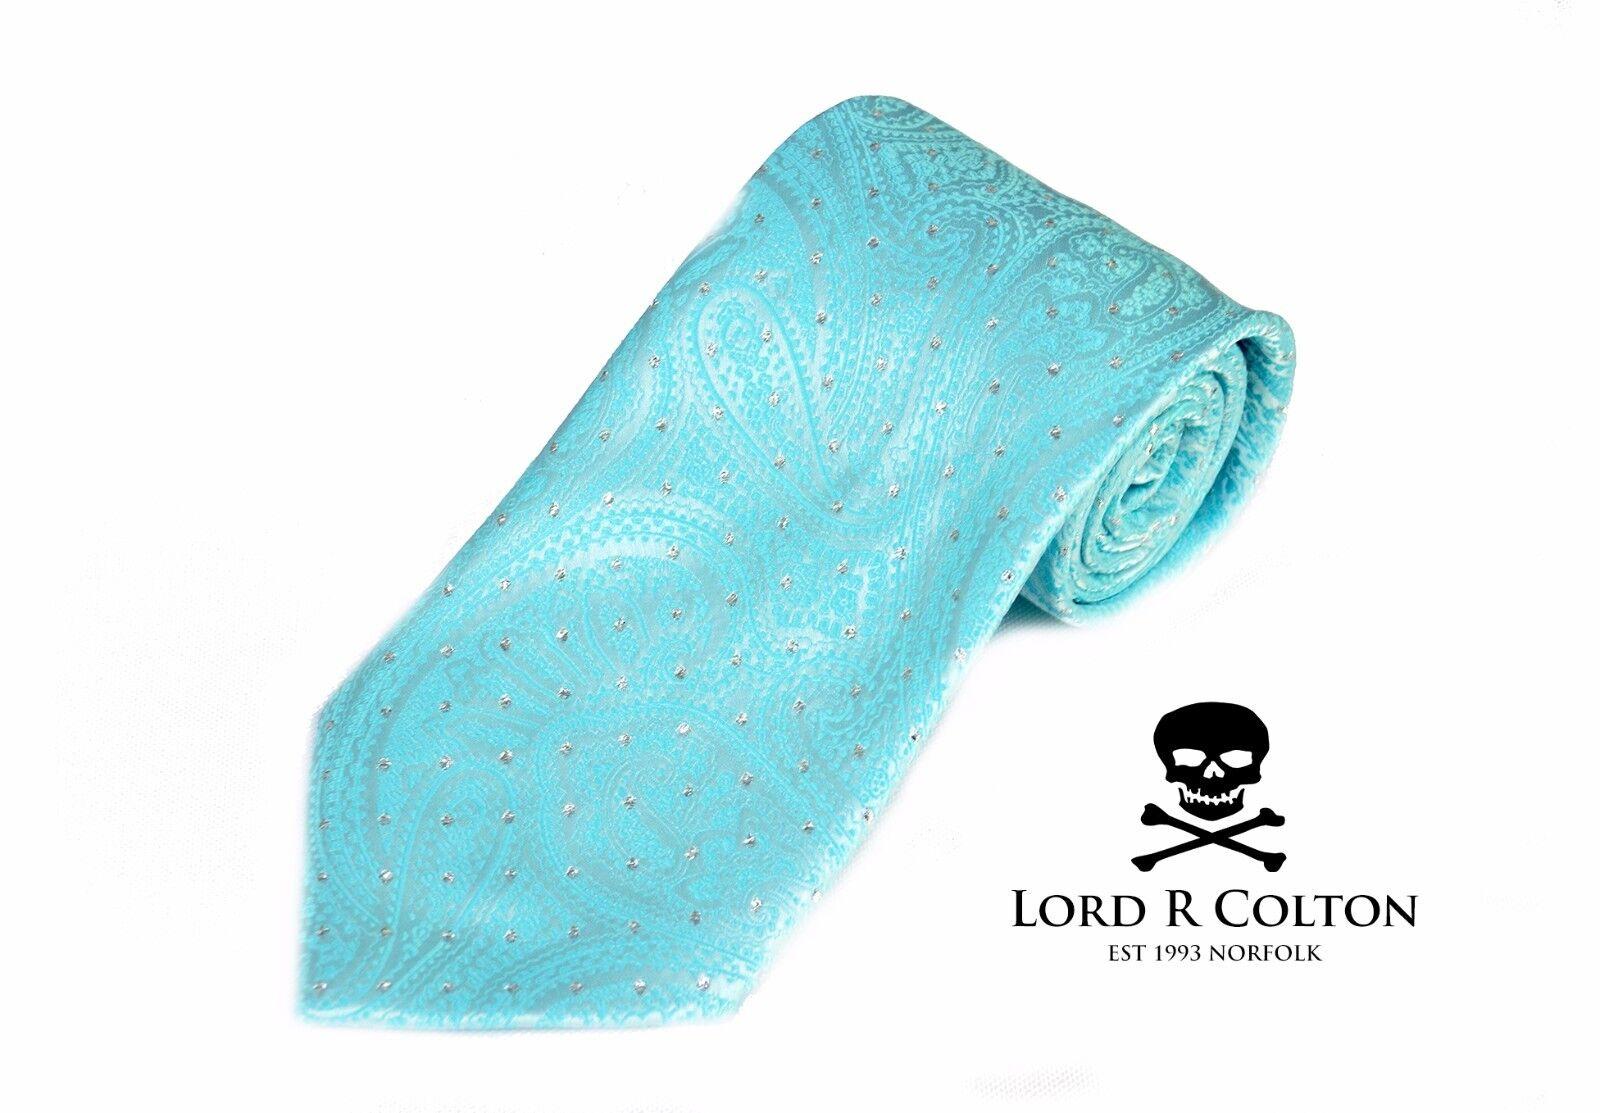 Lord R Colton Meisterwerke Krawatte Krawatte Krawatte Smaragd Führung Hell Seiden Krawatte Neu | Queensland  dc2081